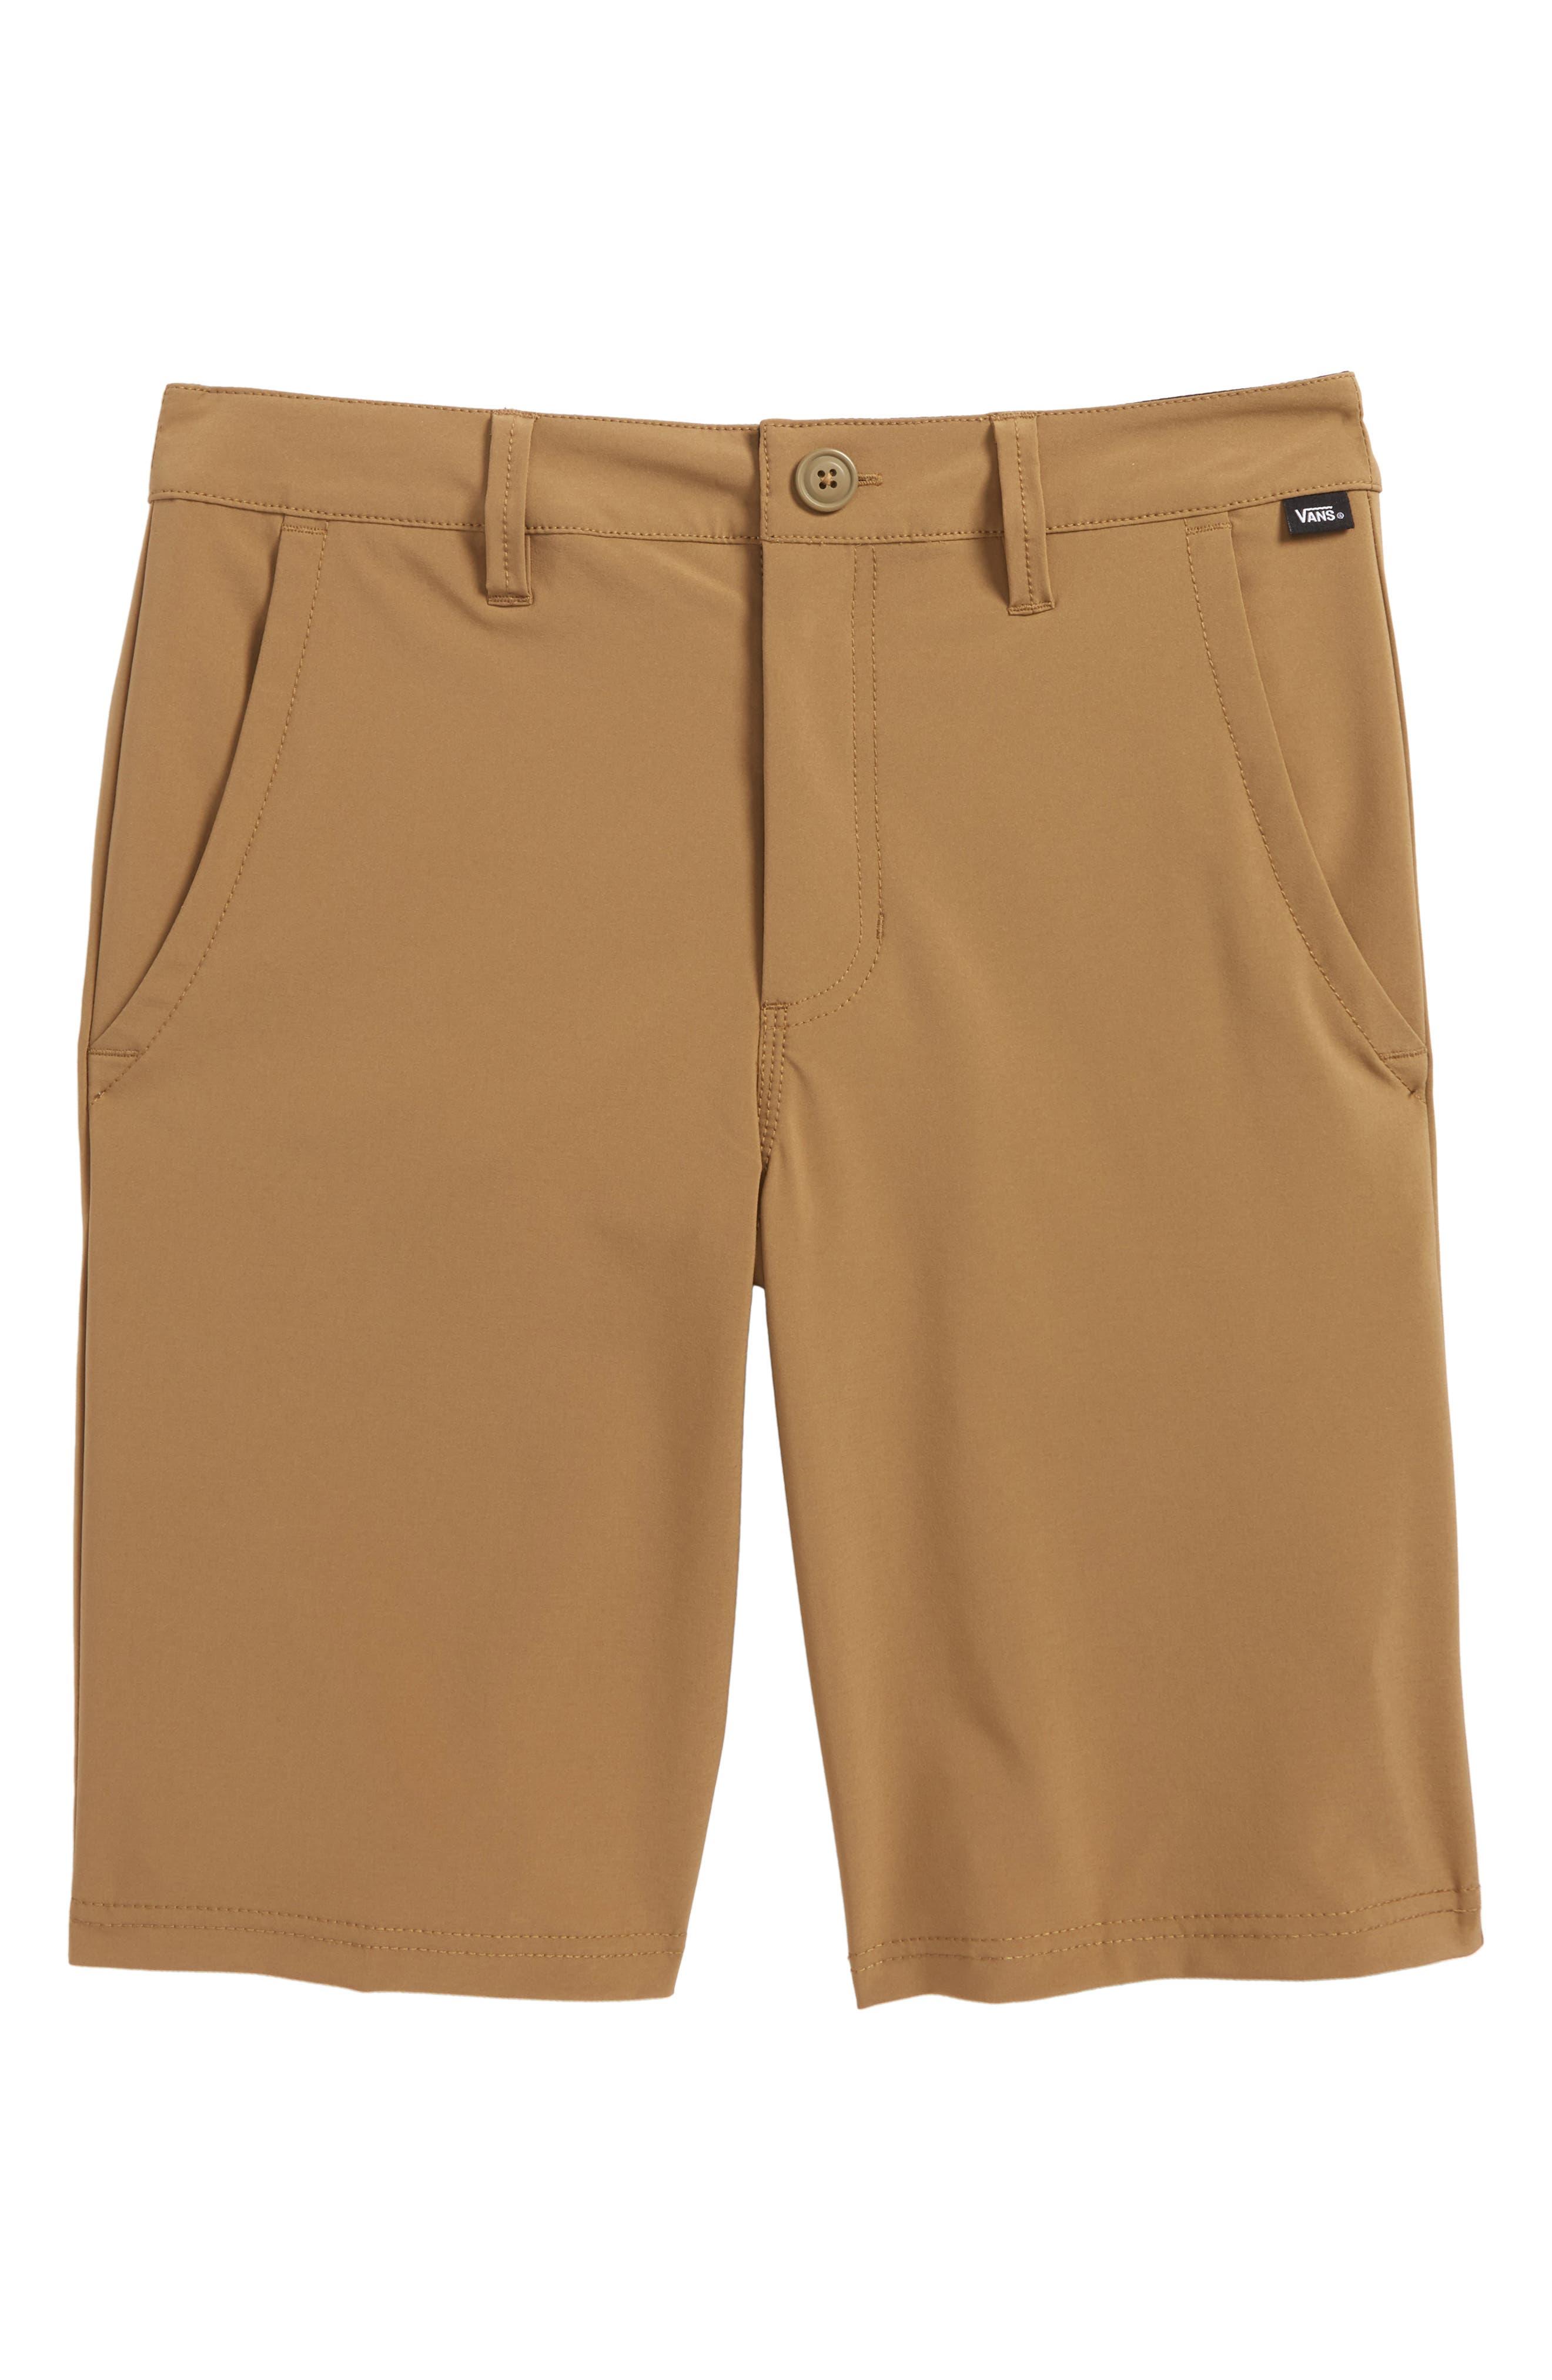 Vans Authentic Decksider Hybrid Shorts (Big Boys)